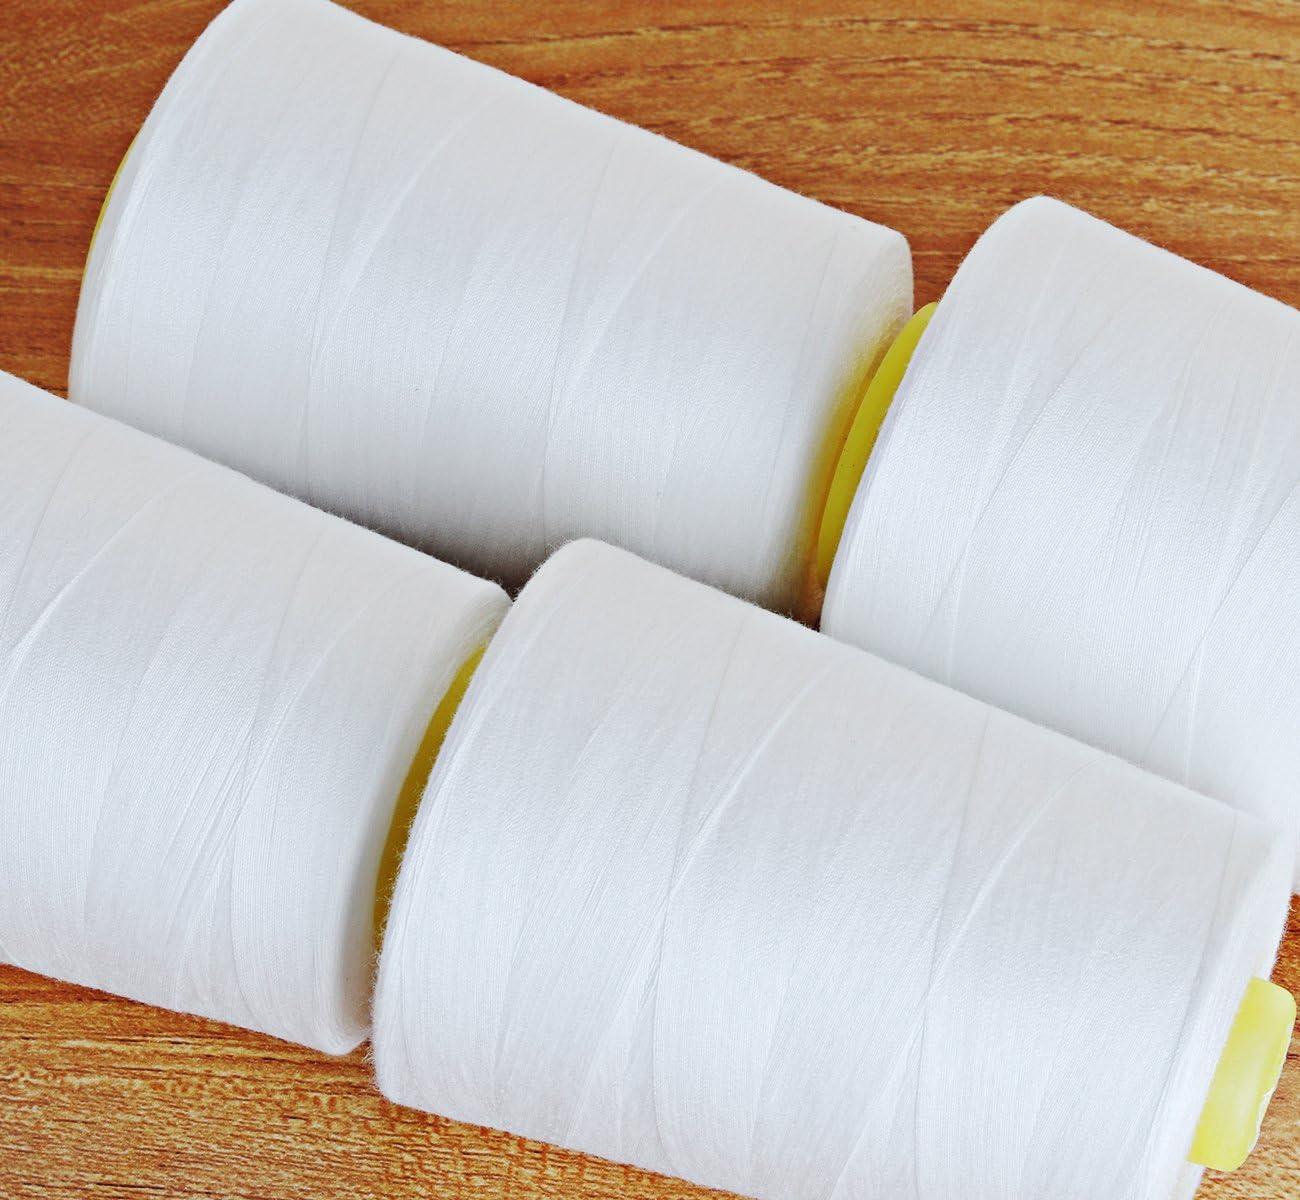 Fili per cucire in poliestere Cubewit 4 PCS Fili per cucire per macchina da cucire 28000 iarde bianco